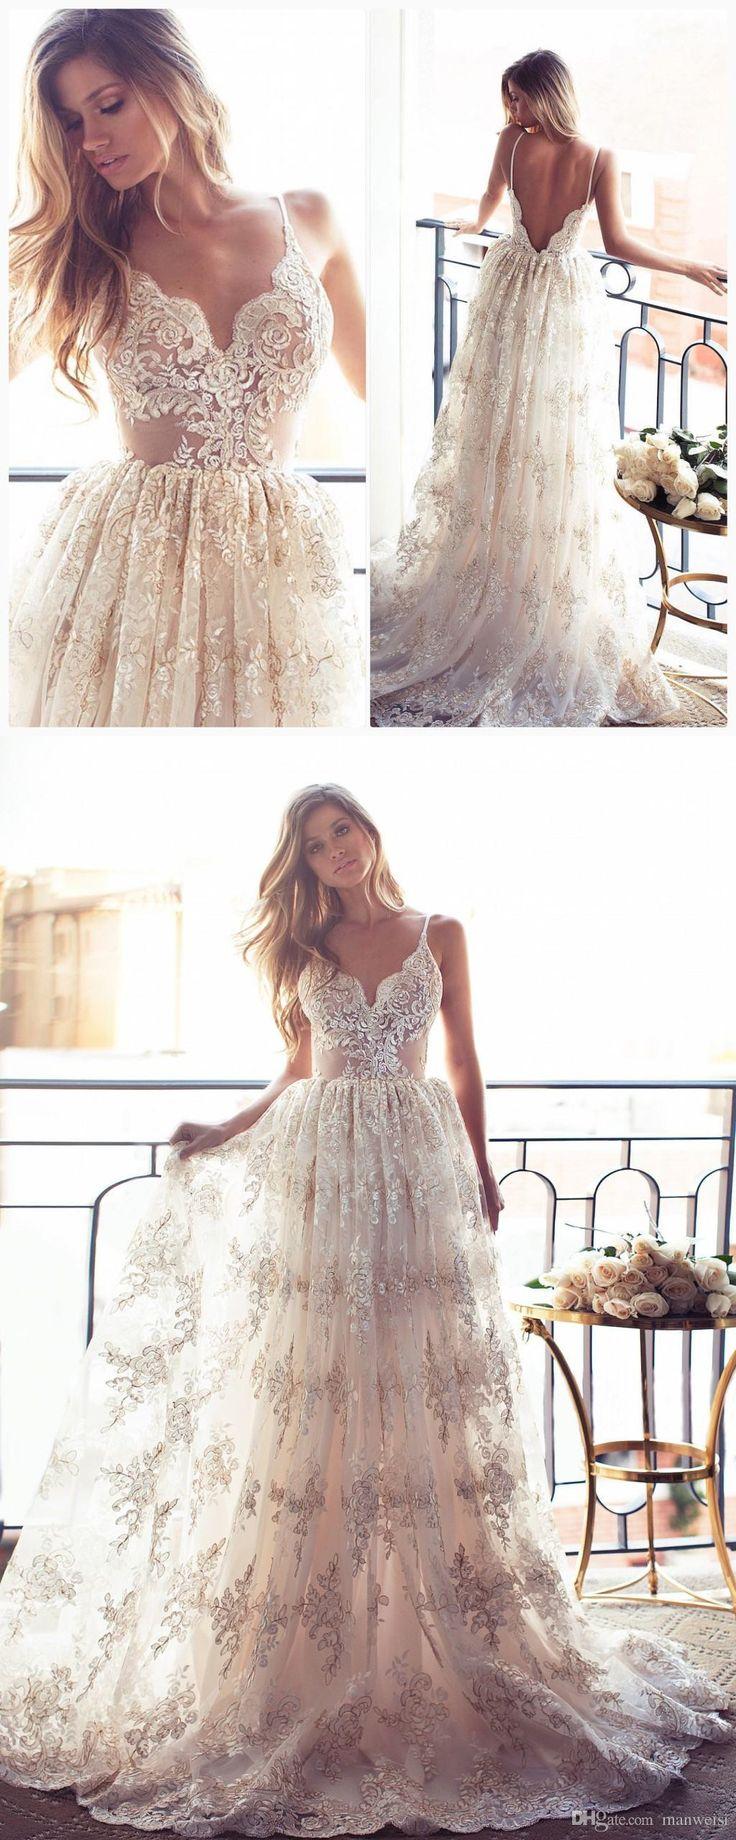 best wedding dress images on pinterest fringe wedding dress